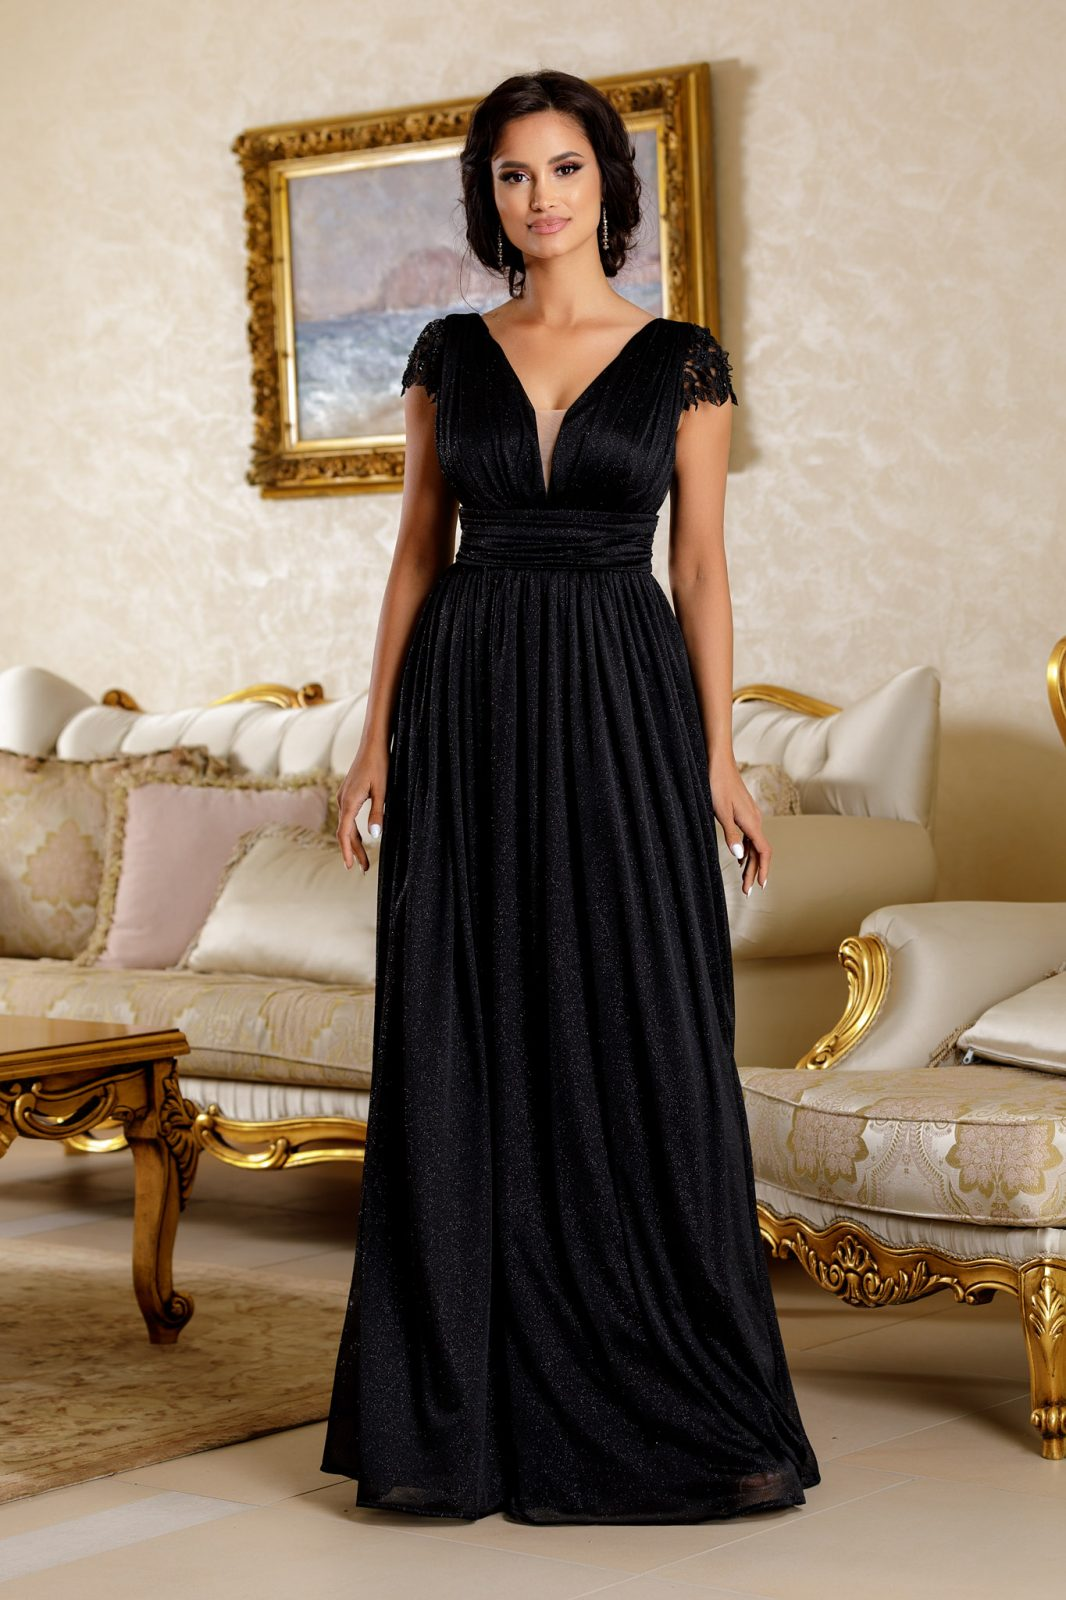 La Donna Beauty Μαύρο Φόρεμα 4787